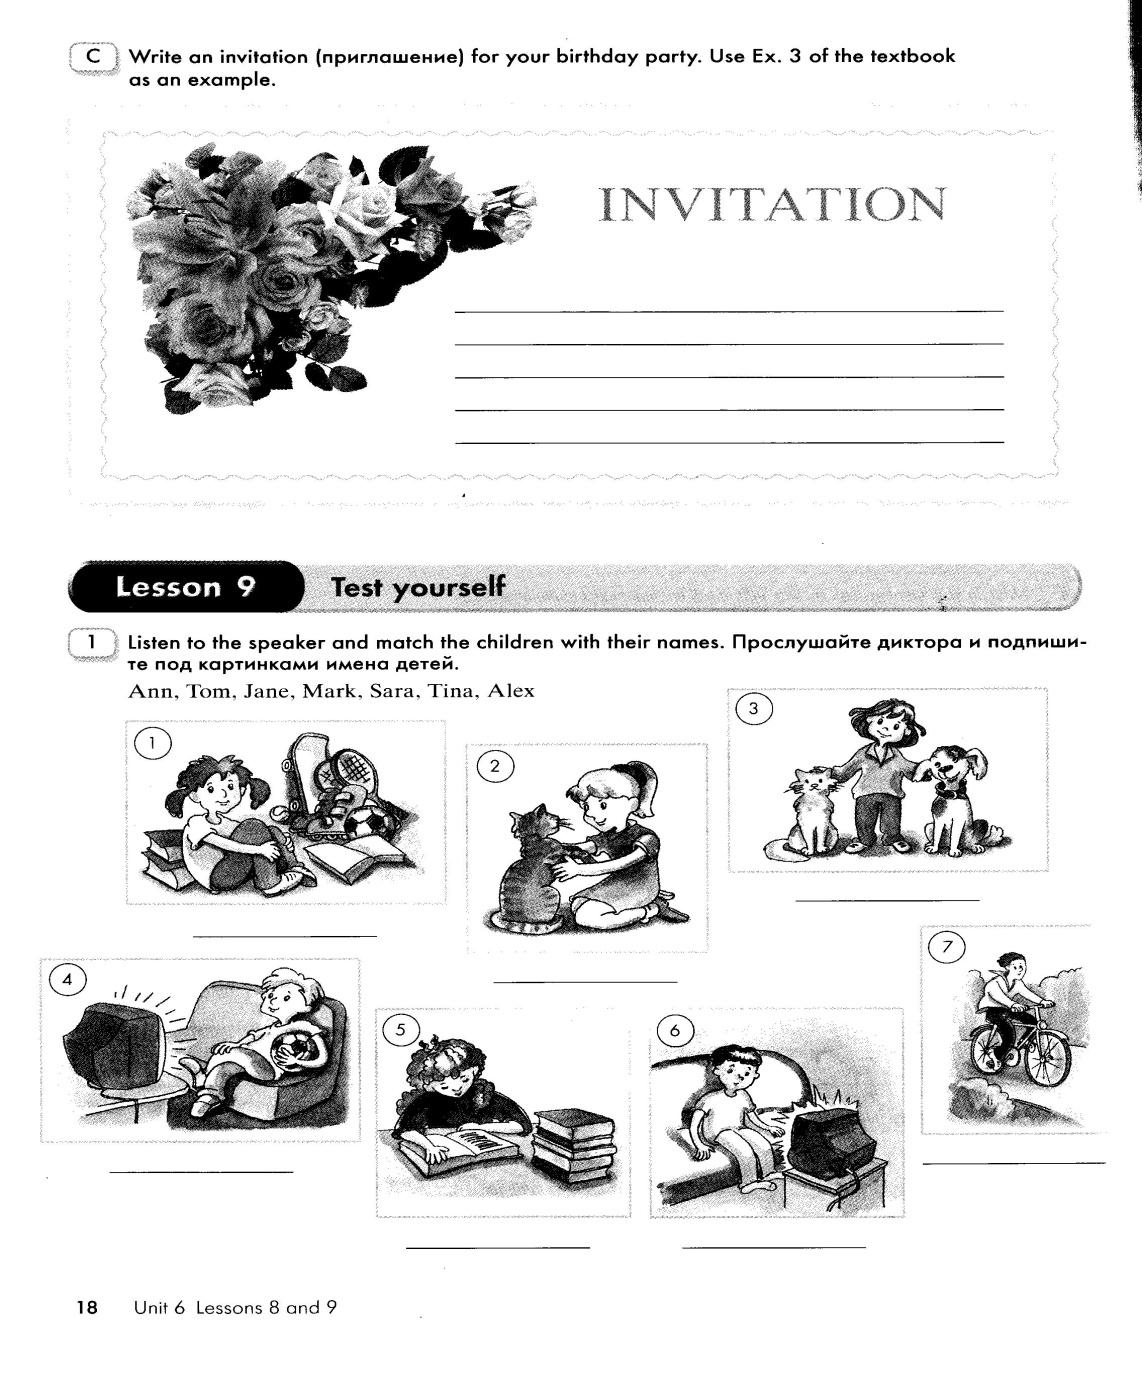 Unit 6, Lesson 9.jpg